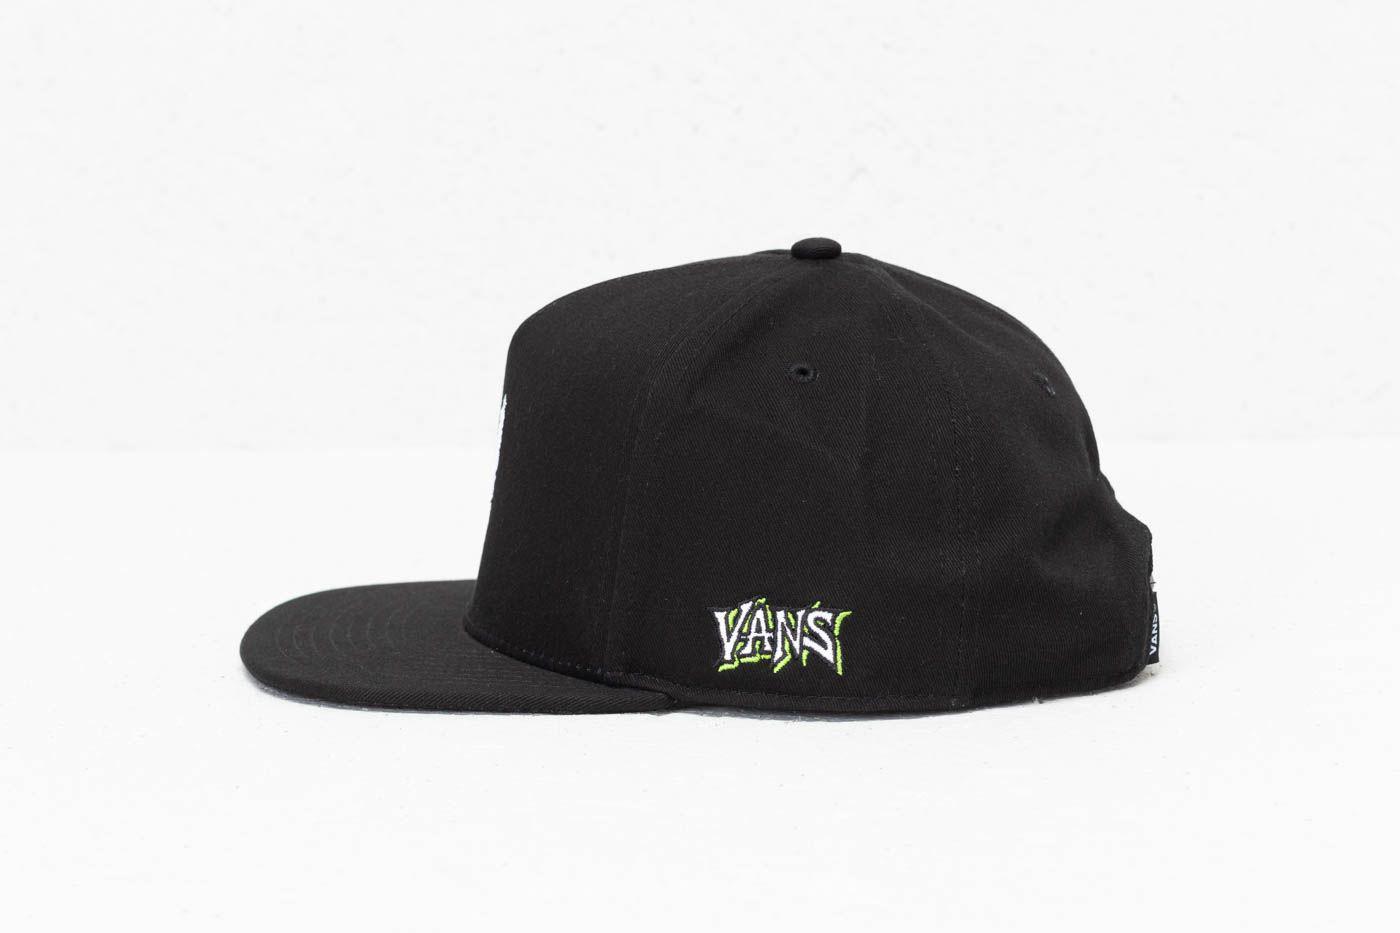 Lyst - Vans Venom Snapback (marvel) Black in Black for Men a6fa6528e64